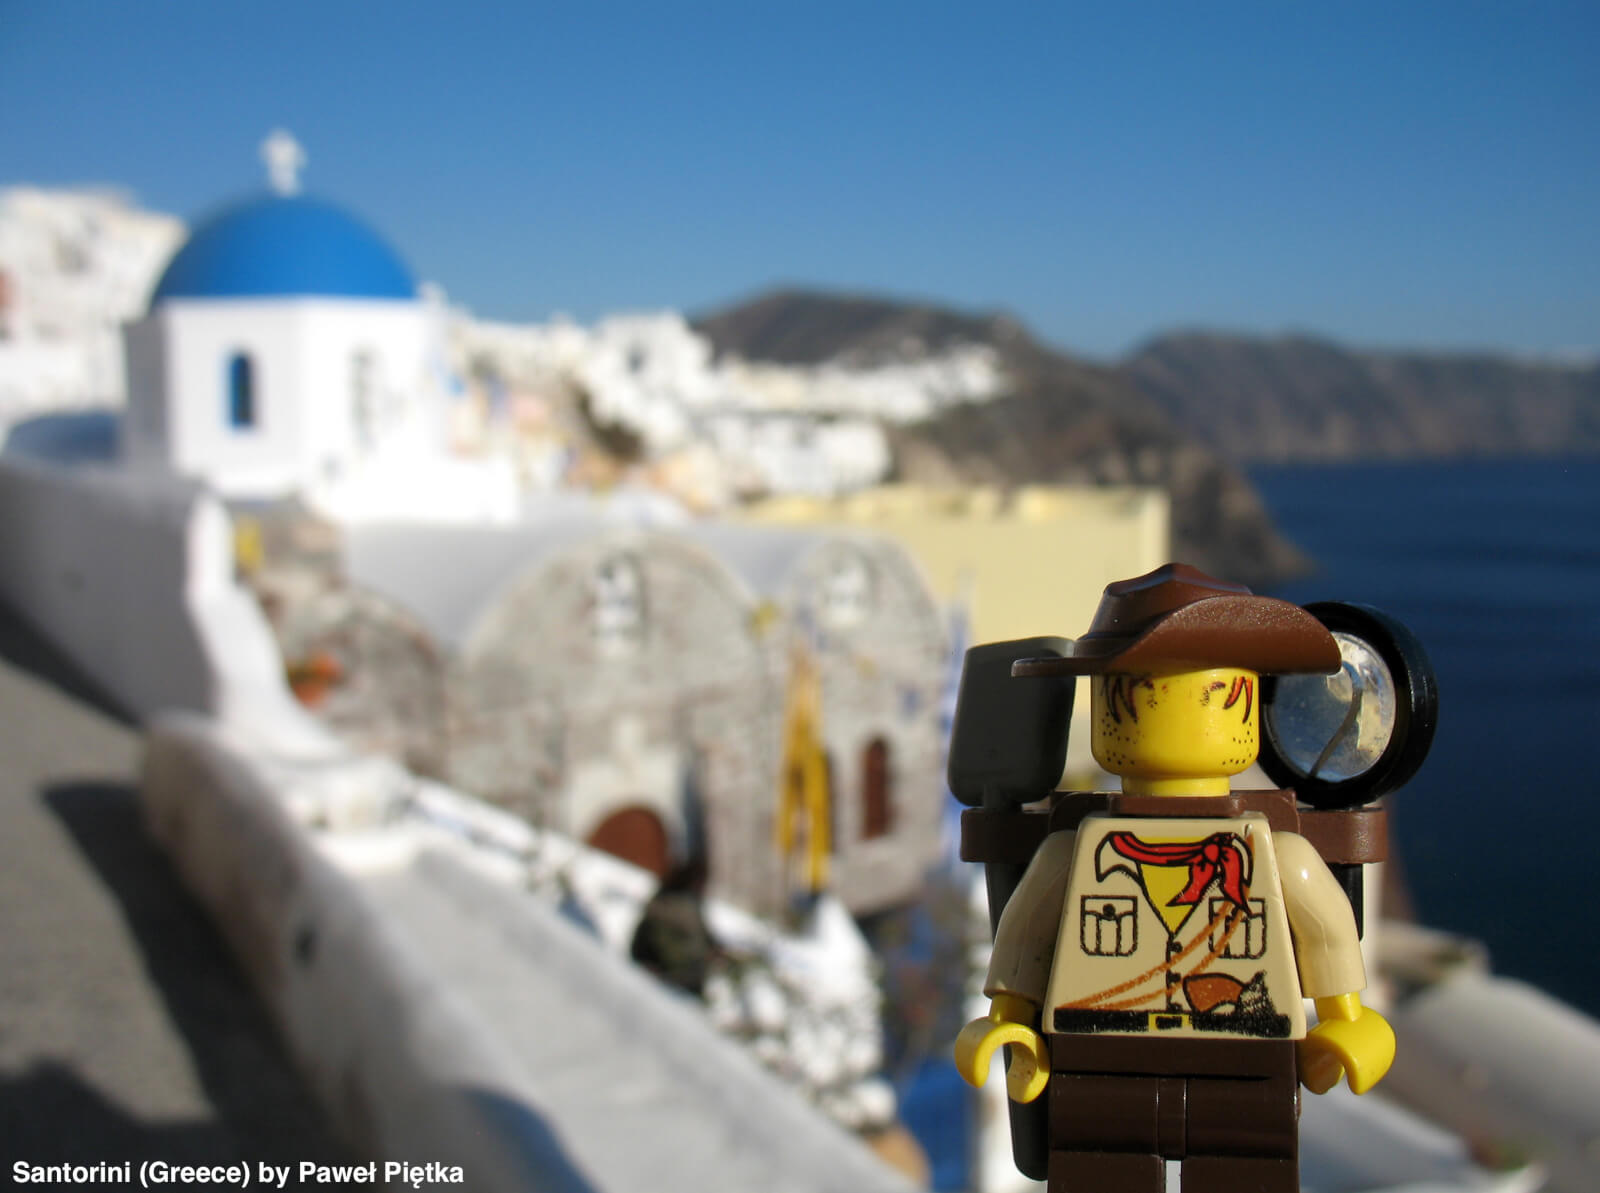 Santorini (Greece) - Oia 2